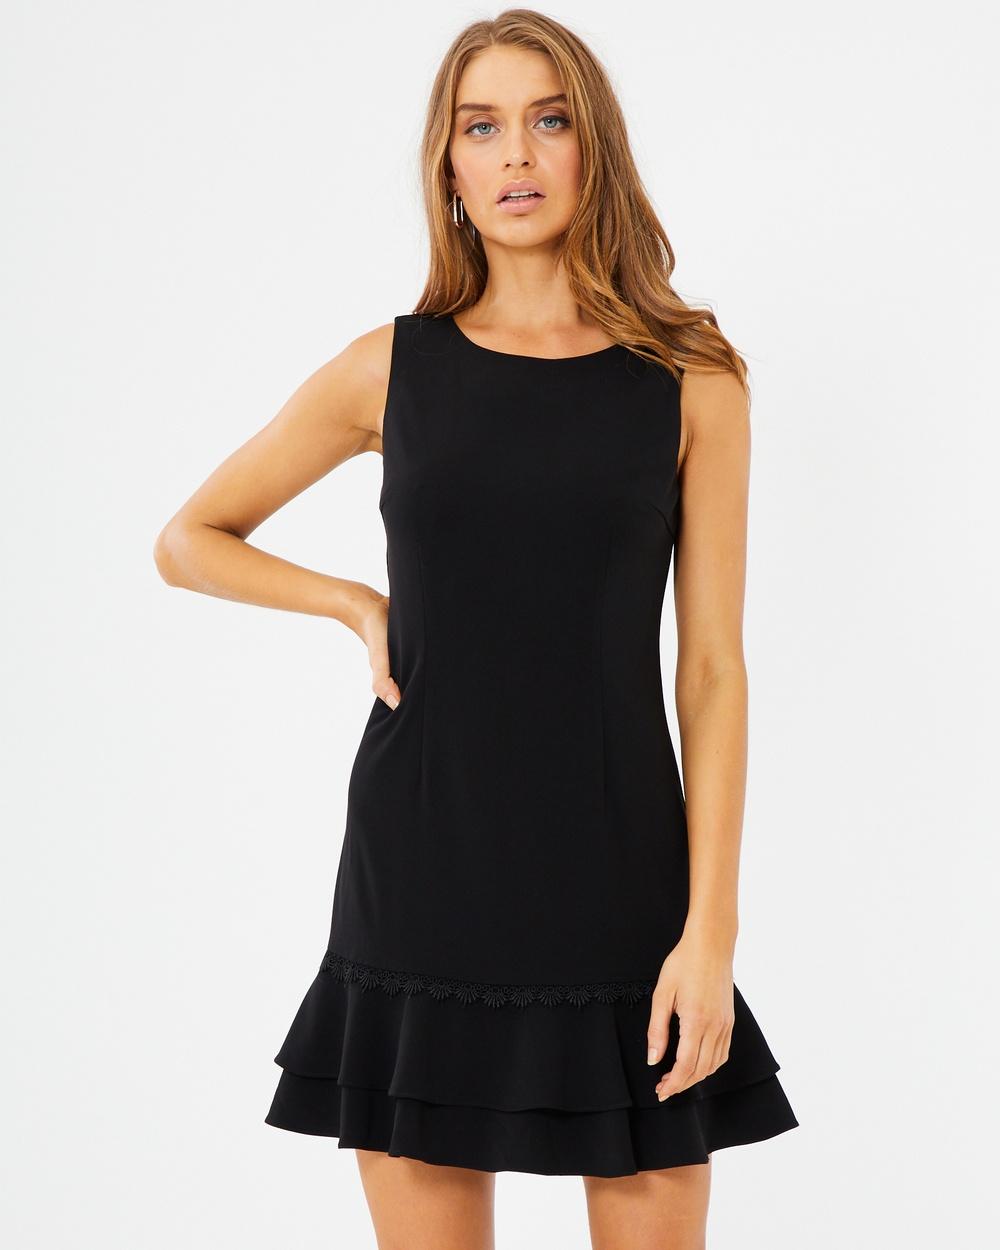 Photo of Tussah Black Marilla Shift Dress - beautiful dress from Tussah online